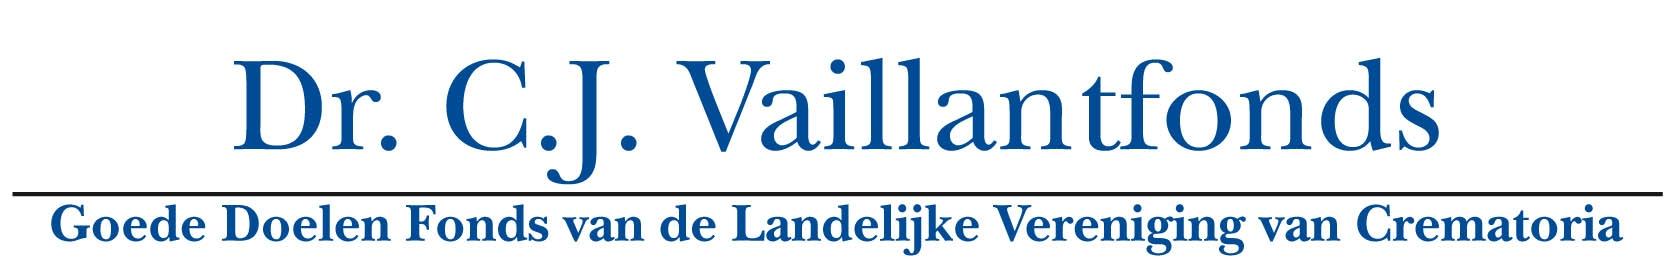 Dr. Vaillantfonds